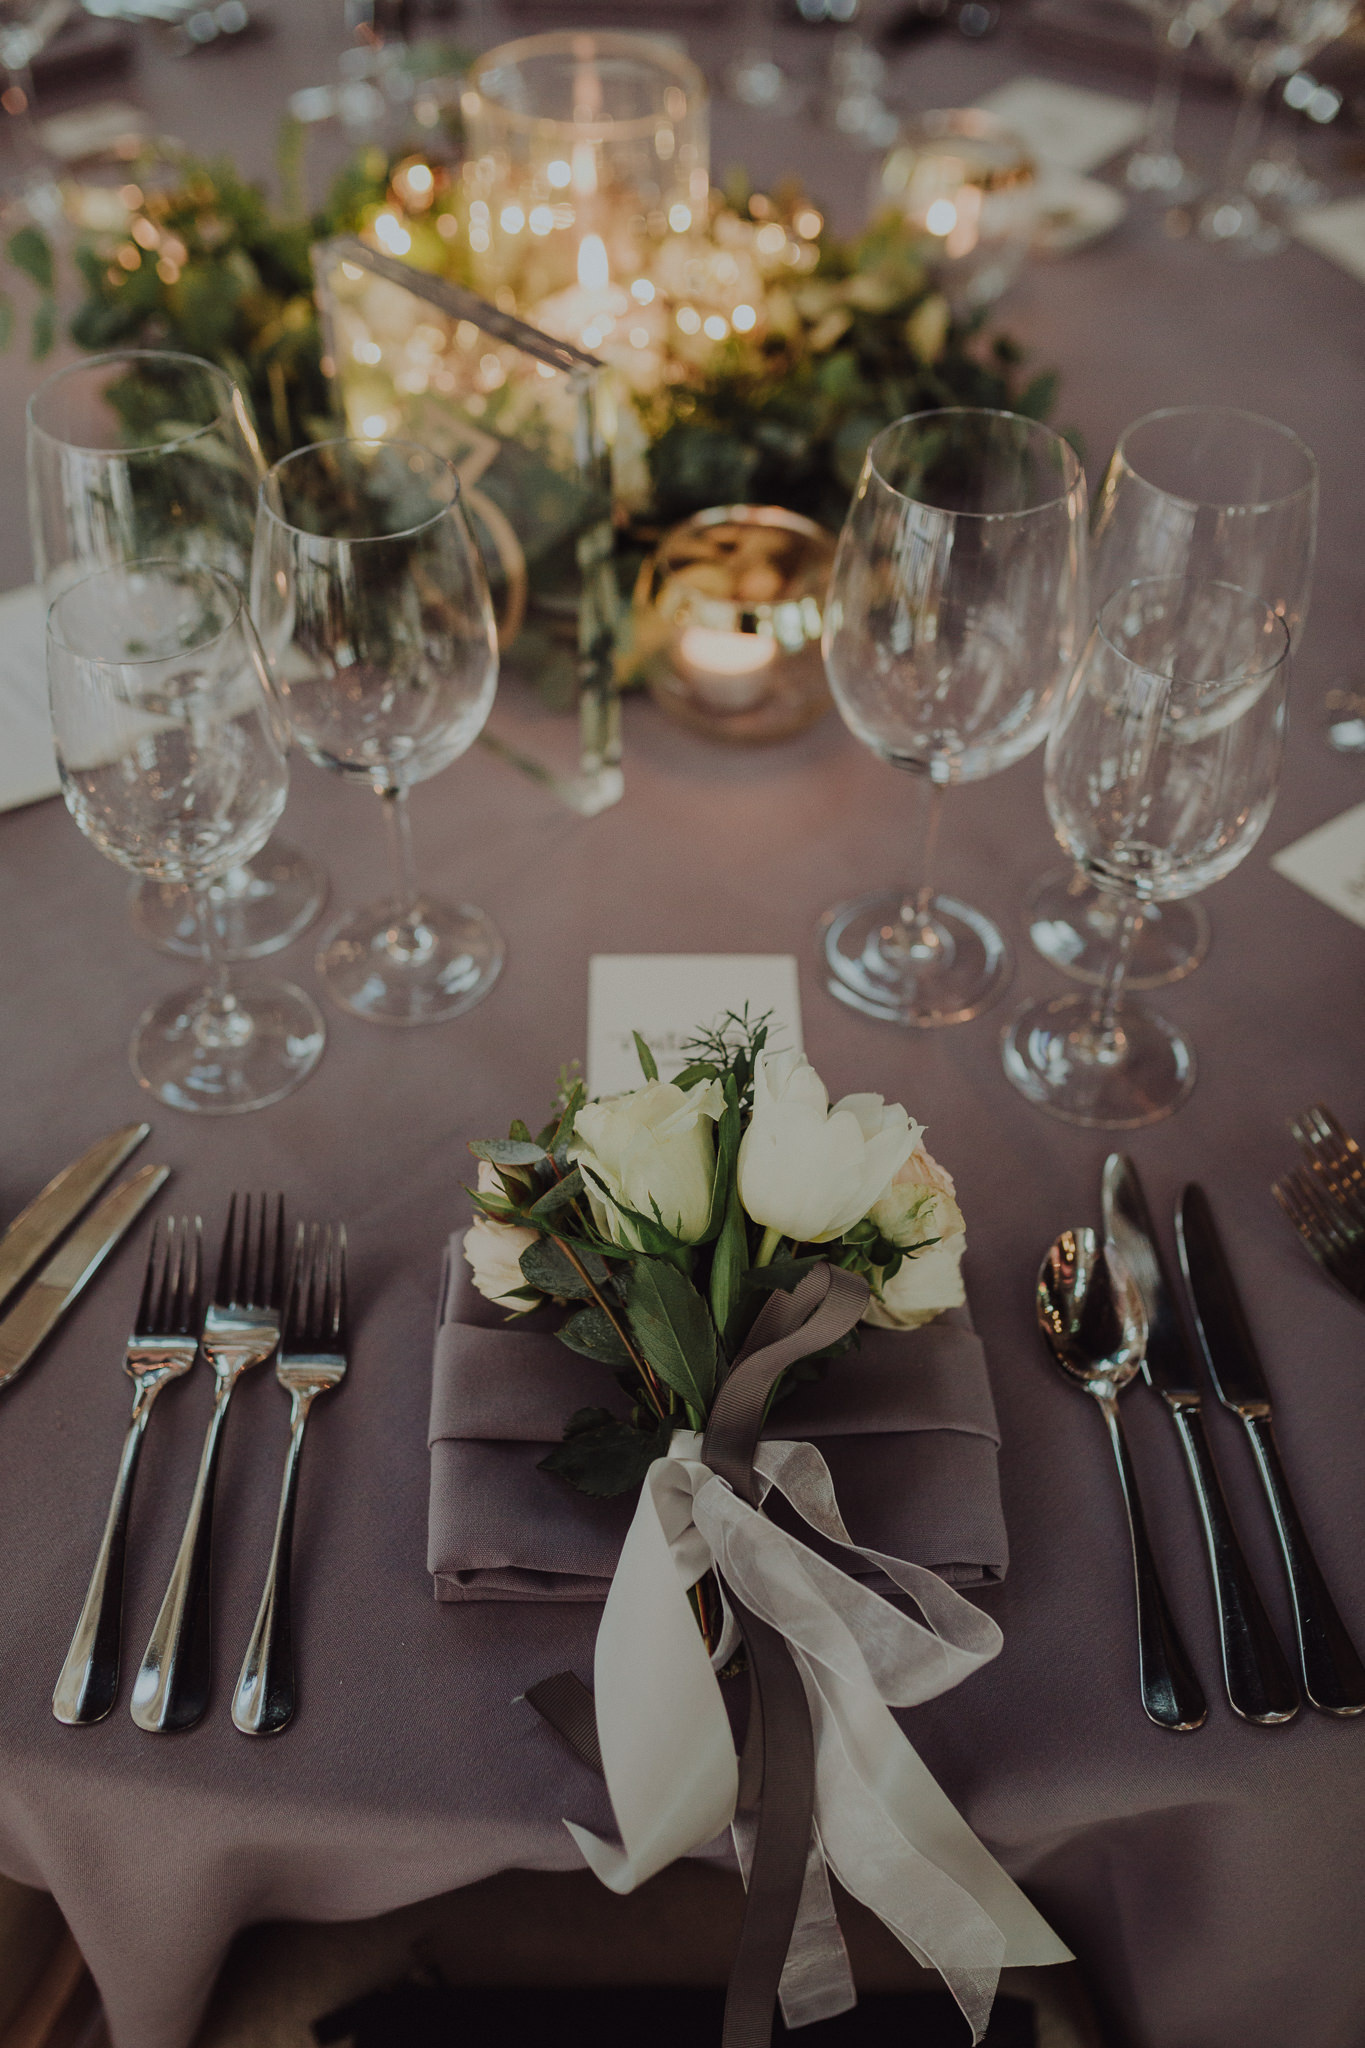 hampstead_wedding_photography_kate_gray-22.jpg